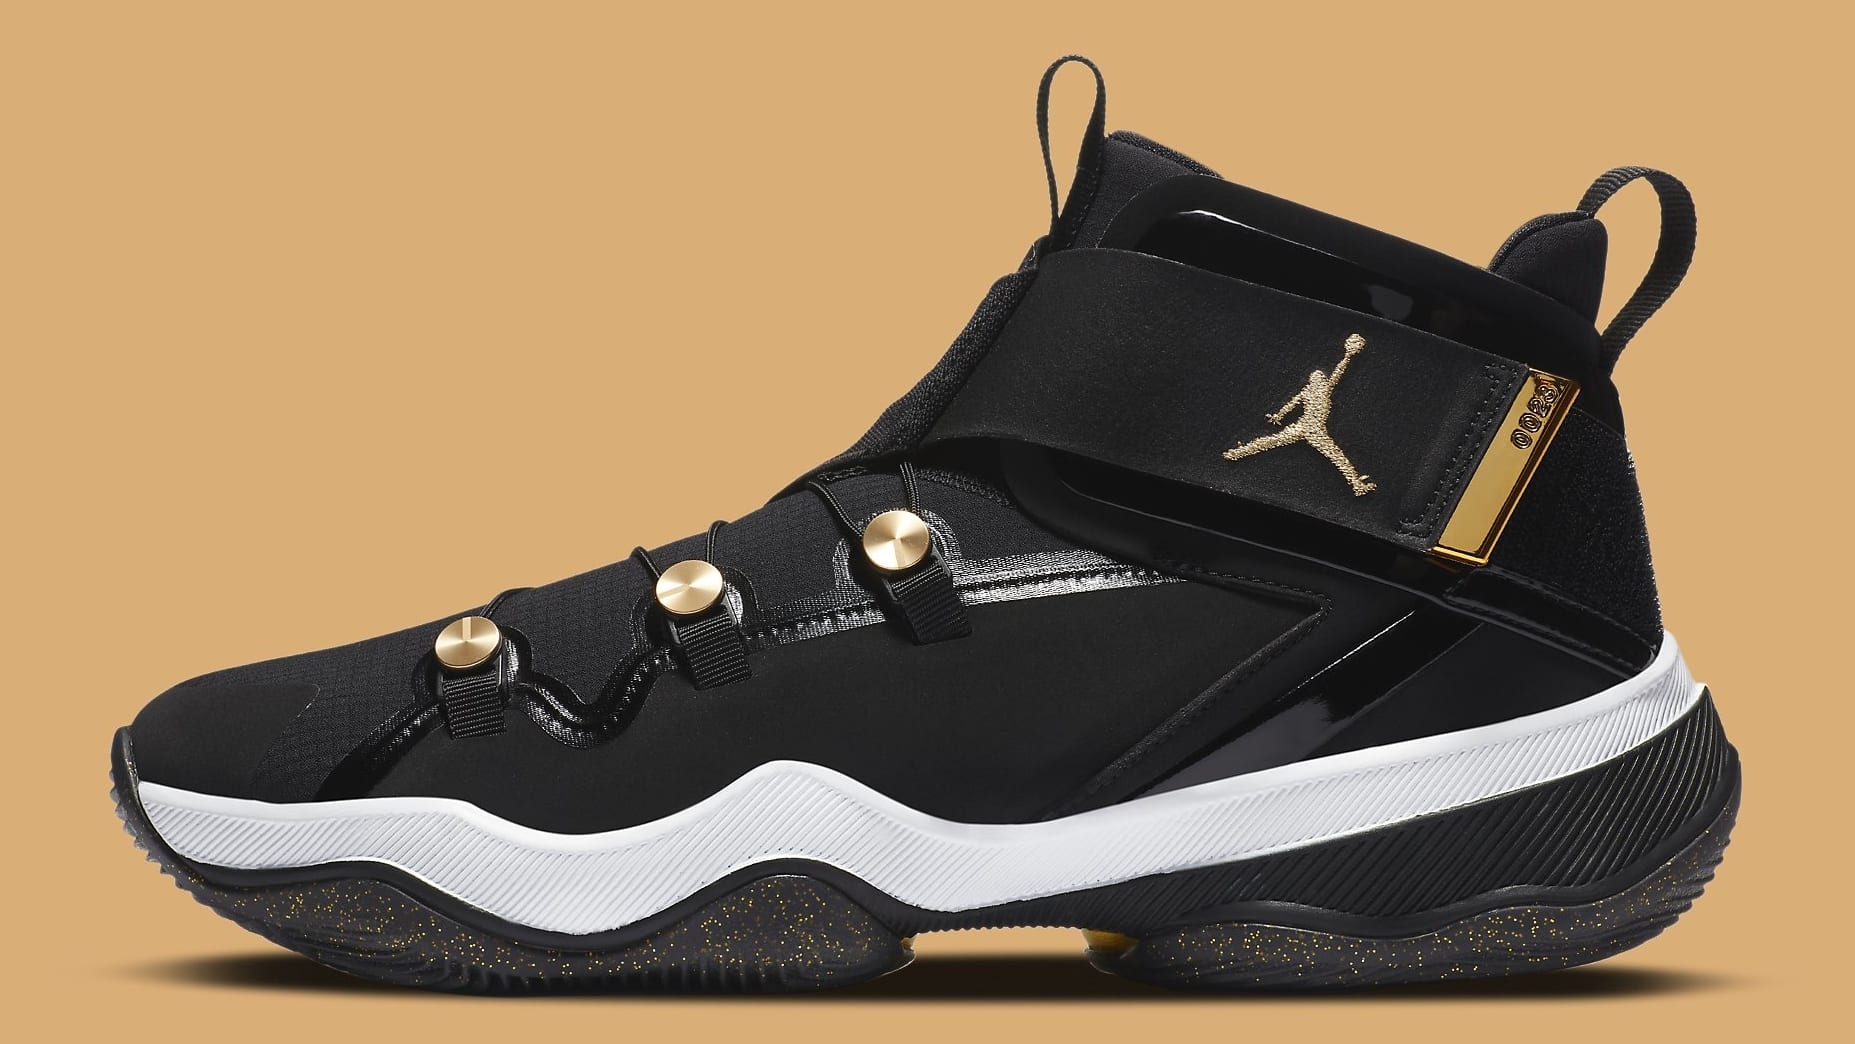 Jordan AJNT 23 Black Gold Release Date CI5441-008 Profile